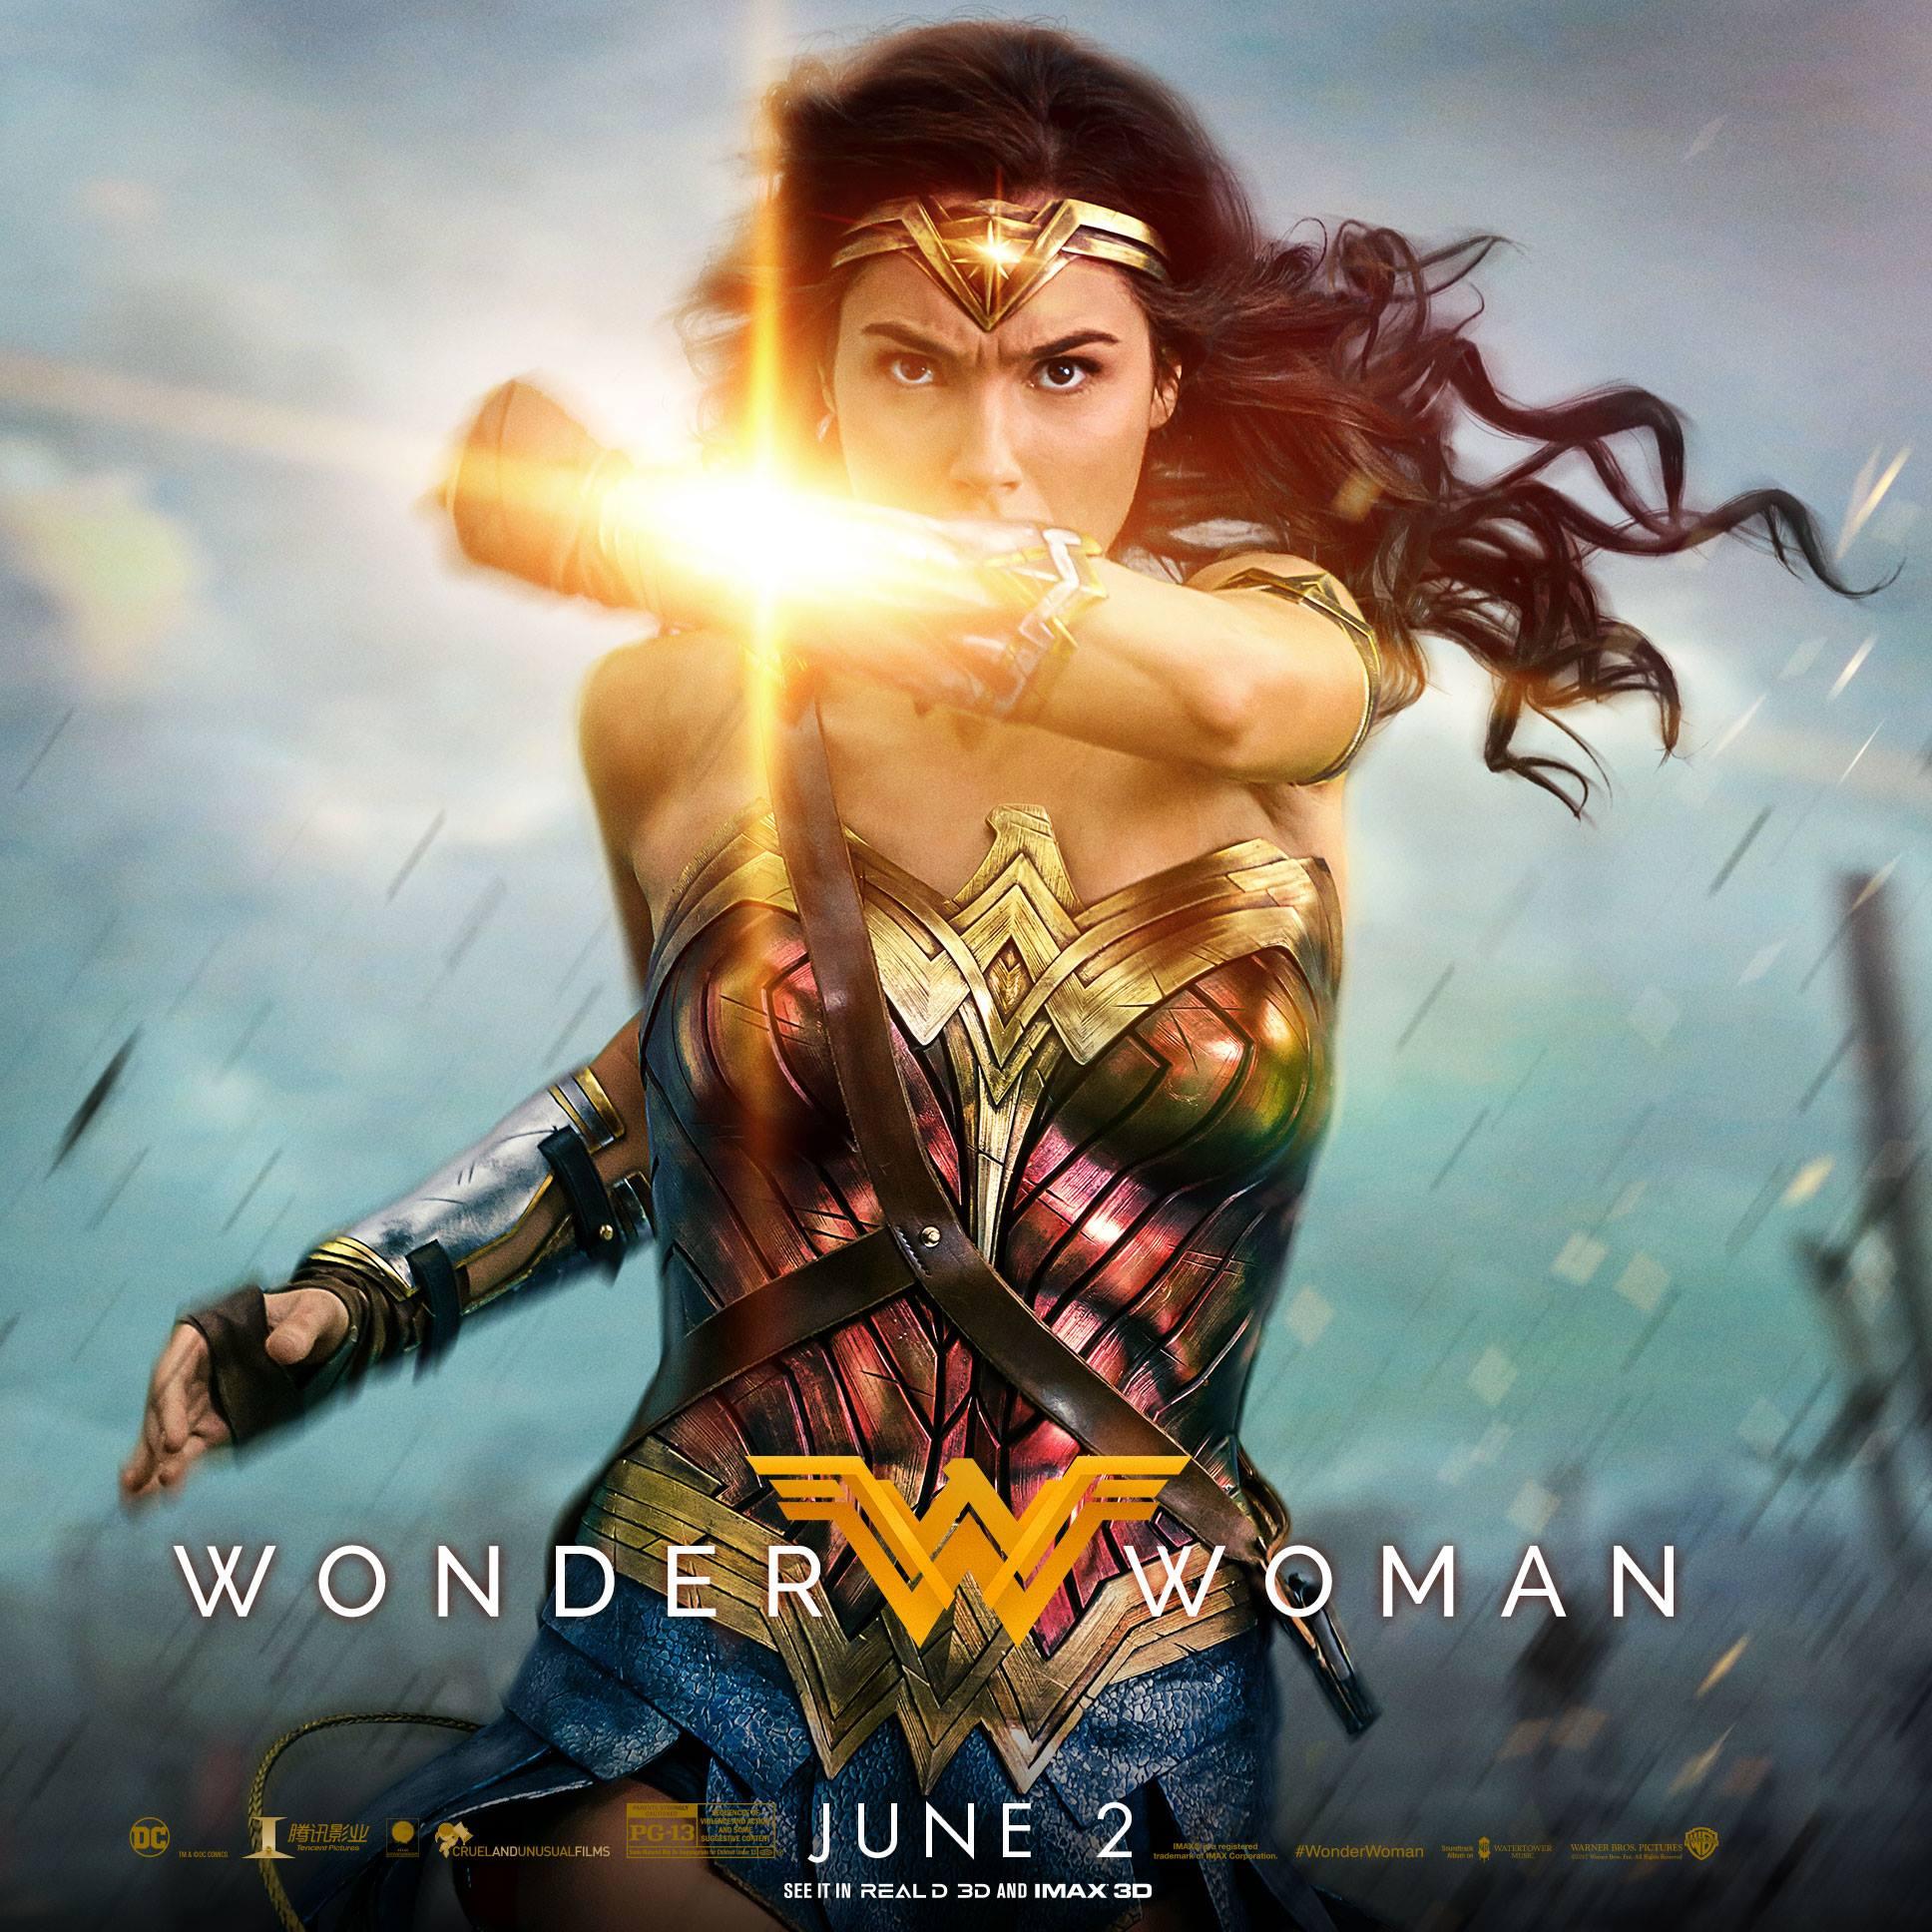 Oficiálny plagát pre Wonder Woman